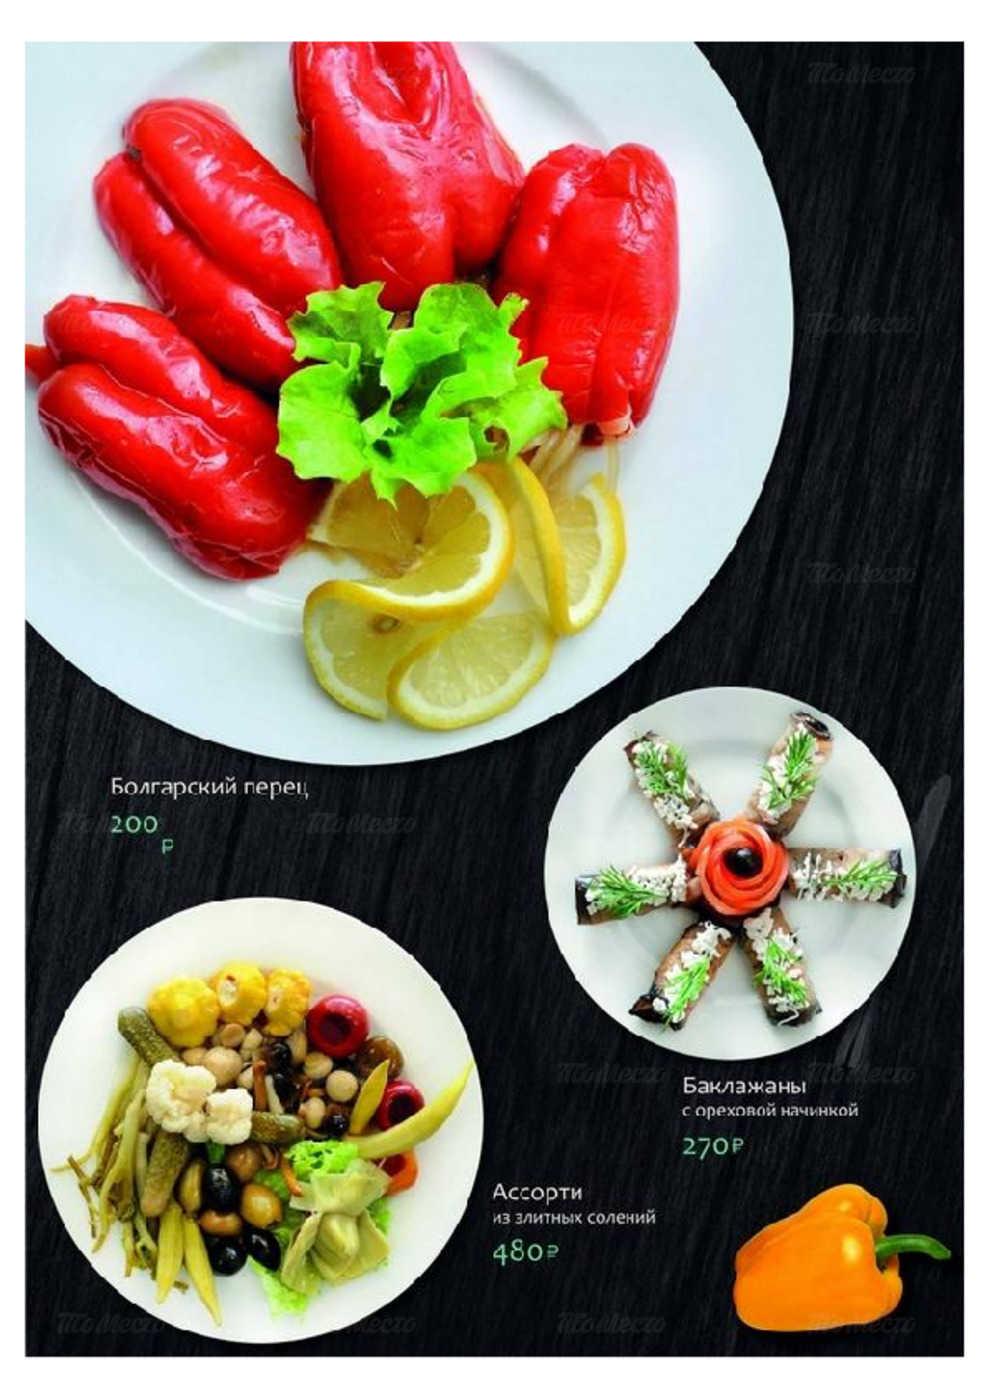 Меню ресторана Любимый Хабиб на проспекте Стачек фото 7